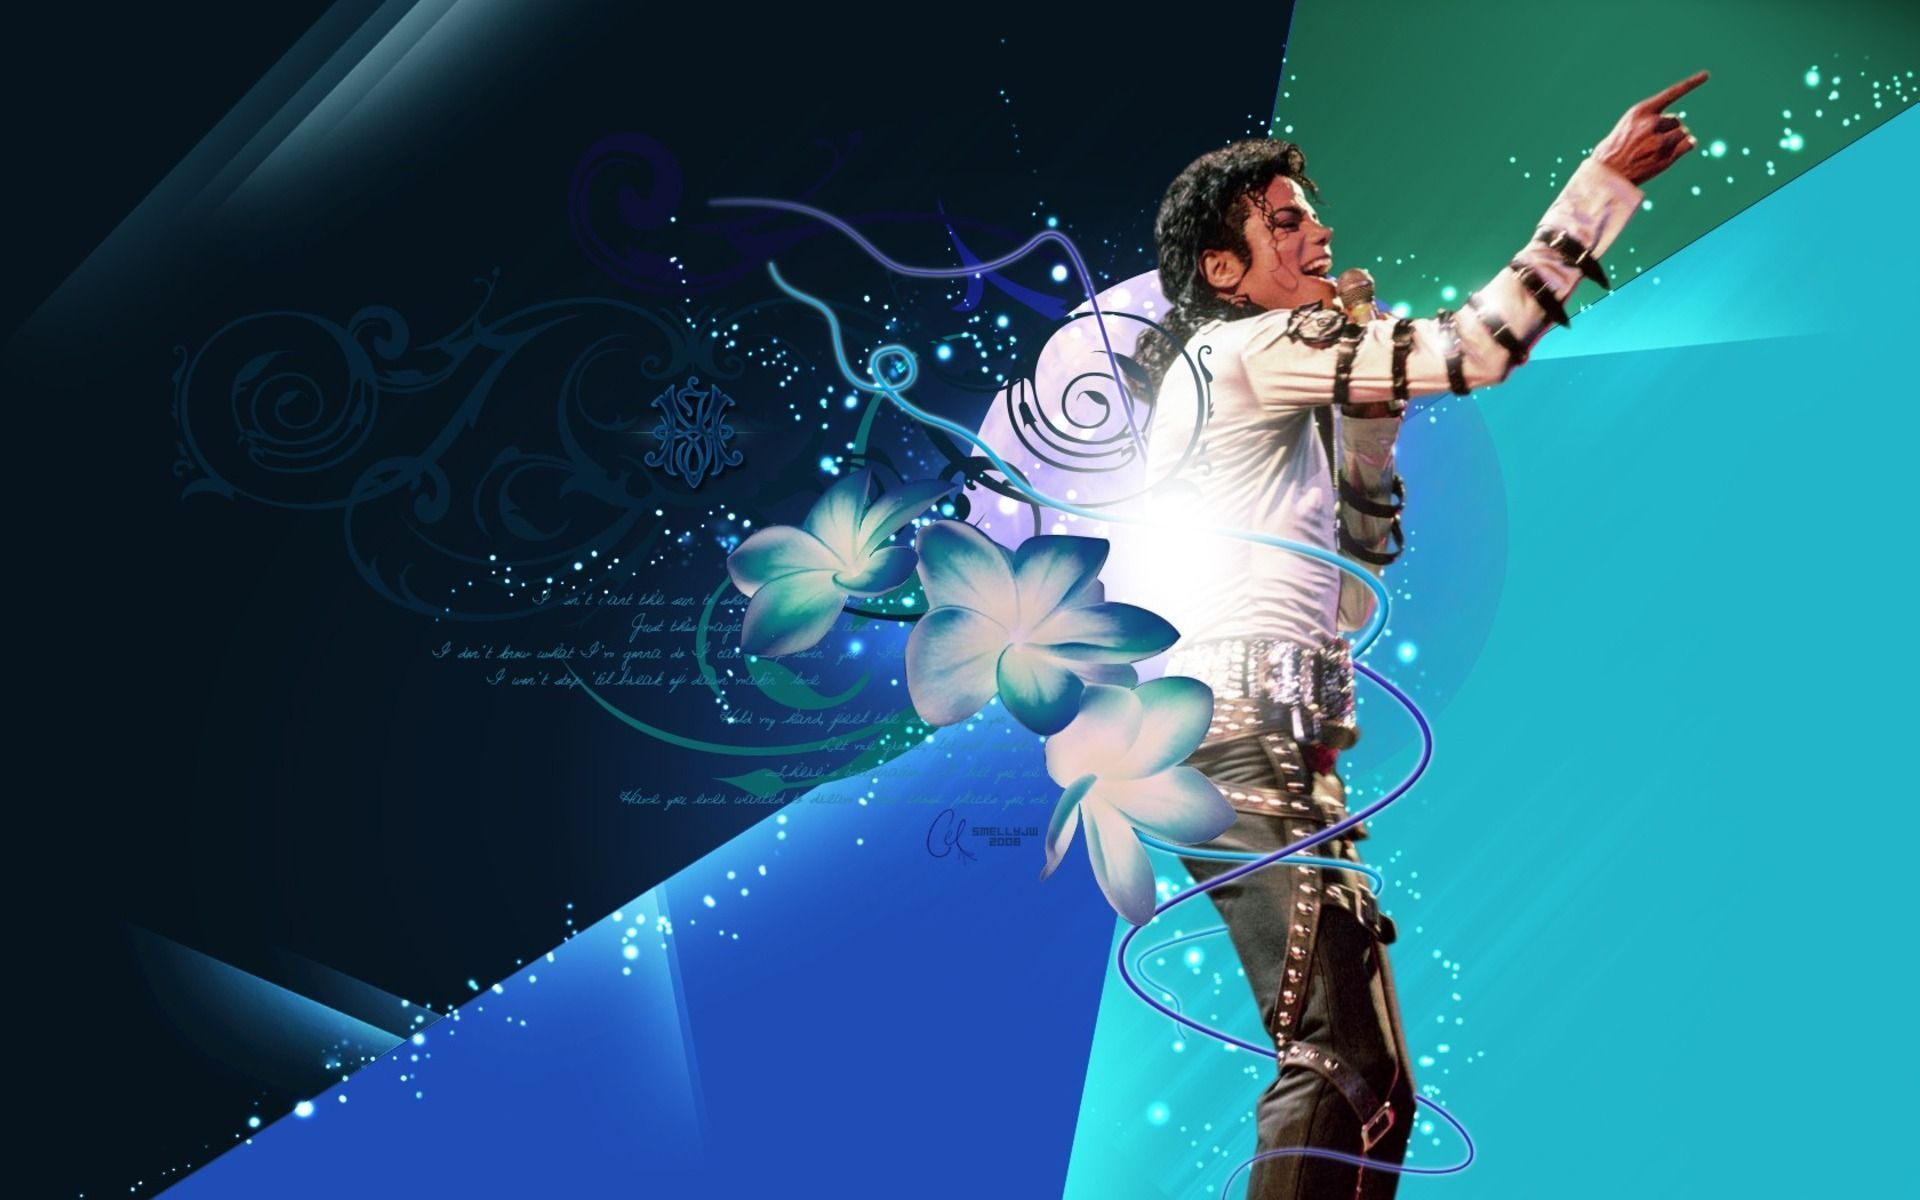 Michael Jackson wallpaper Male Celebrity wallpapers